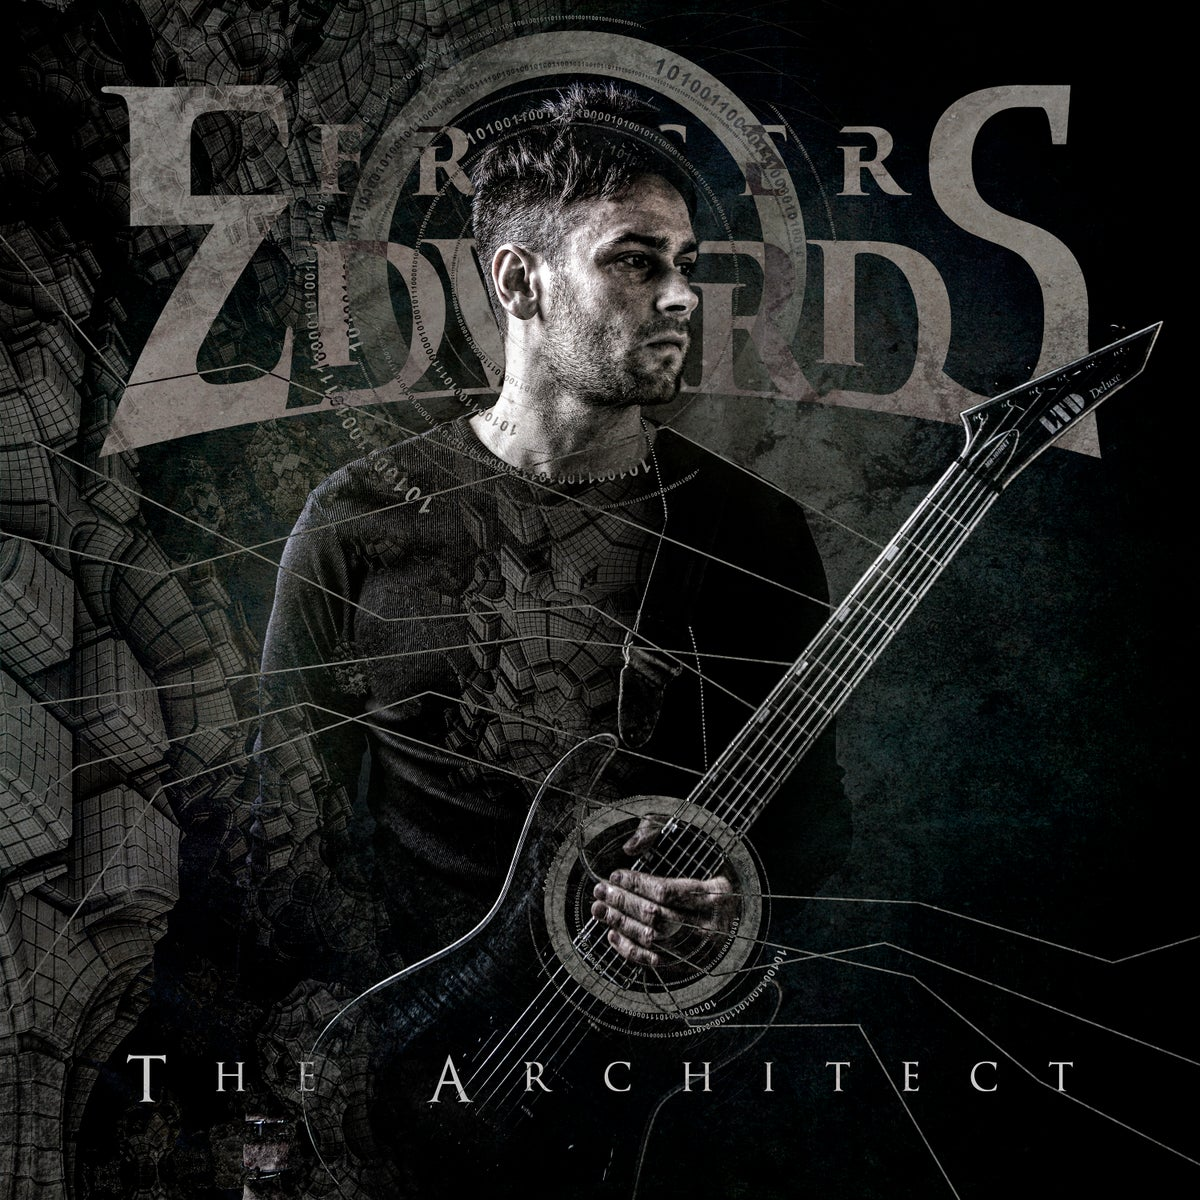 The Architect CD